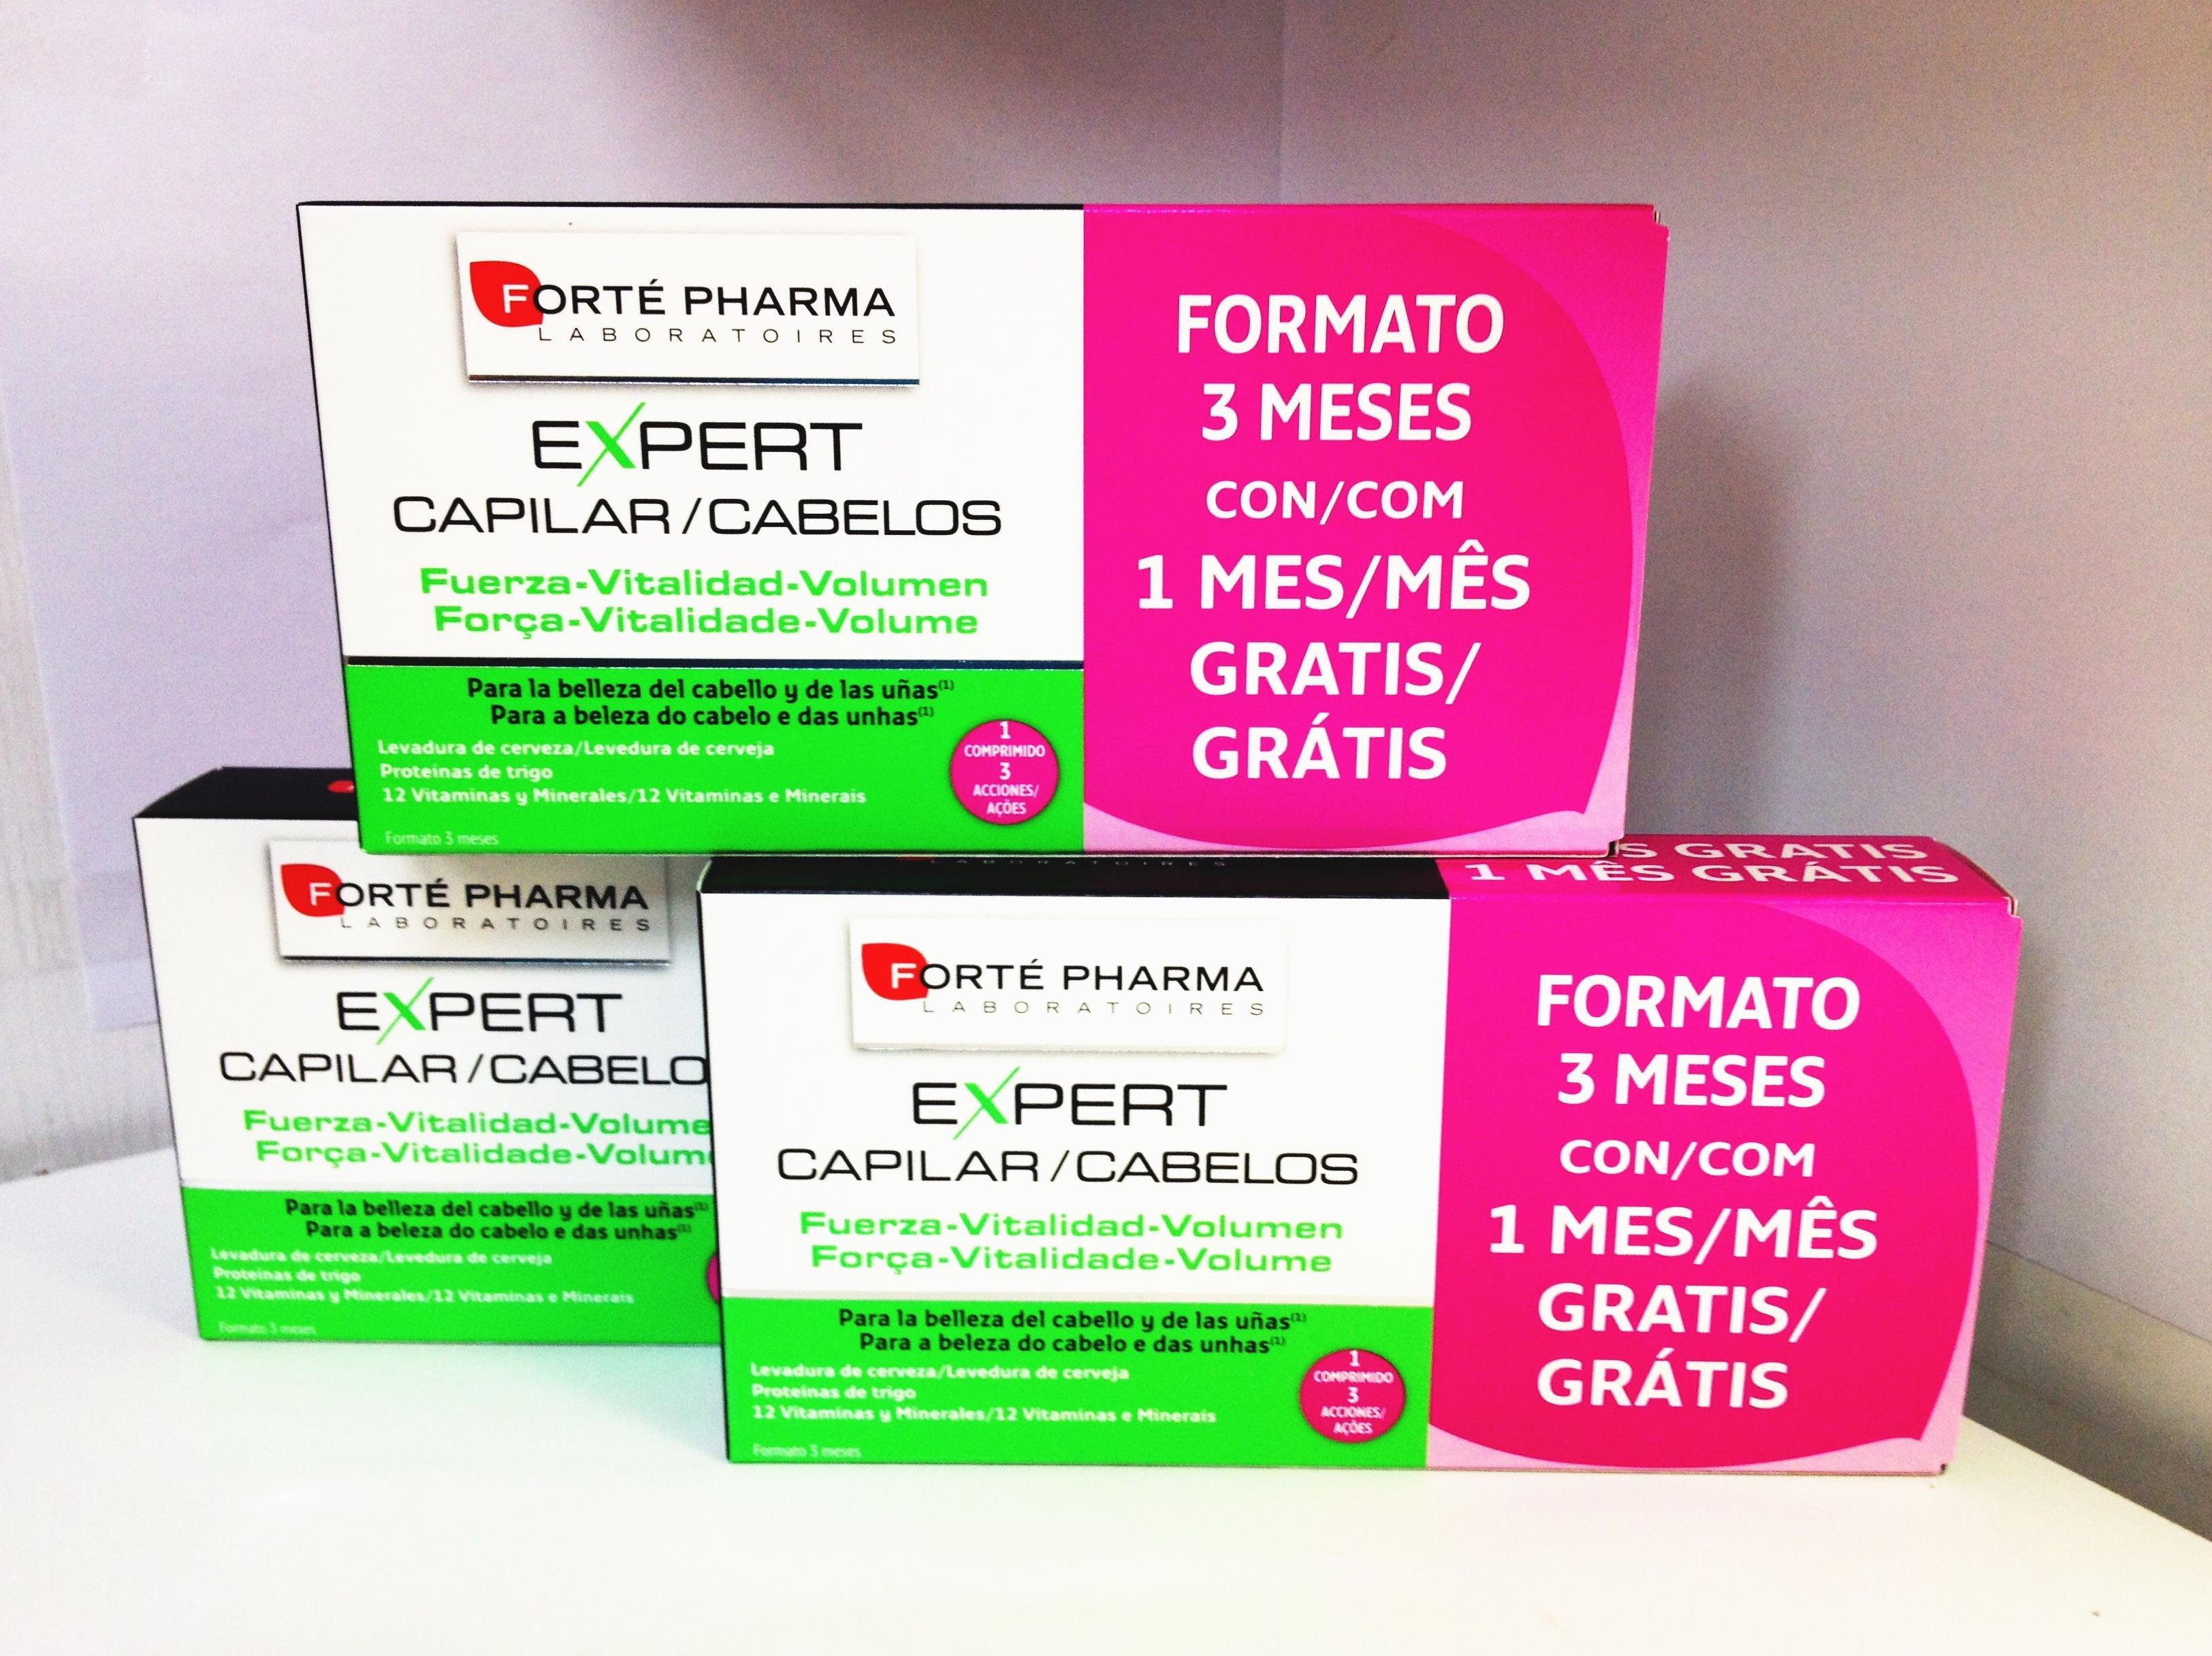 Foto 17 de Farmacias en Terrassa | Farmacia-Ortopedia Can Parellada